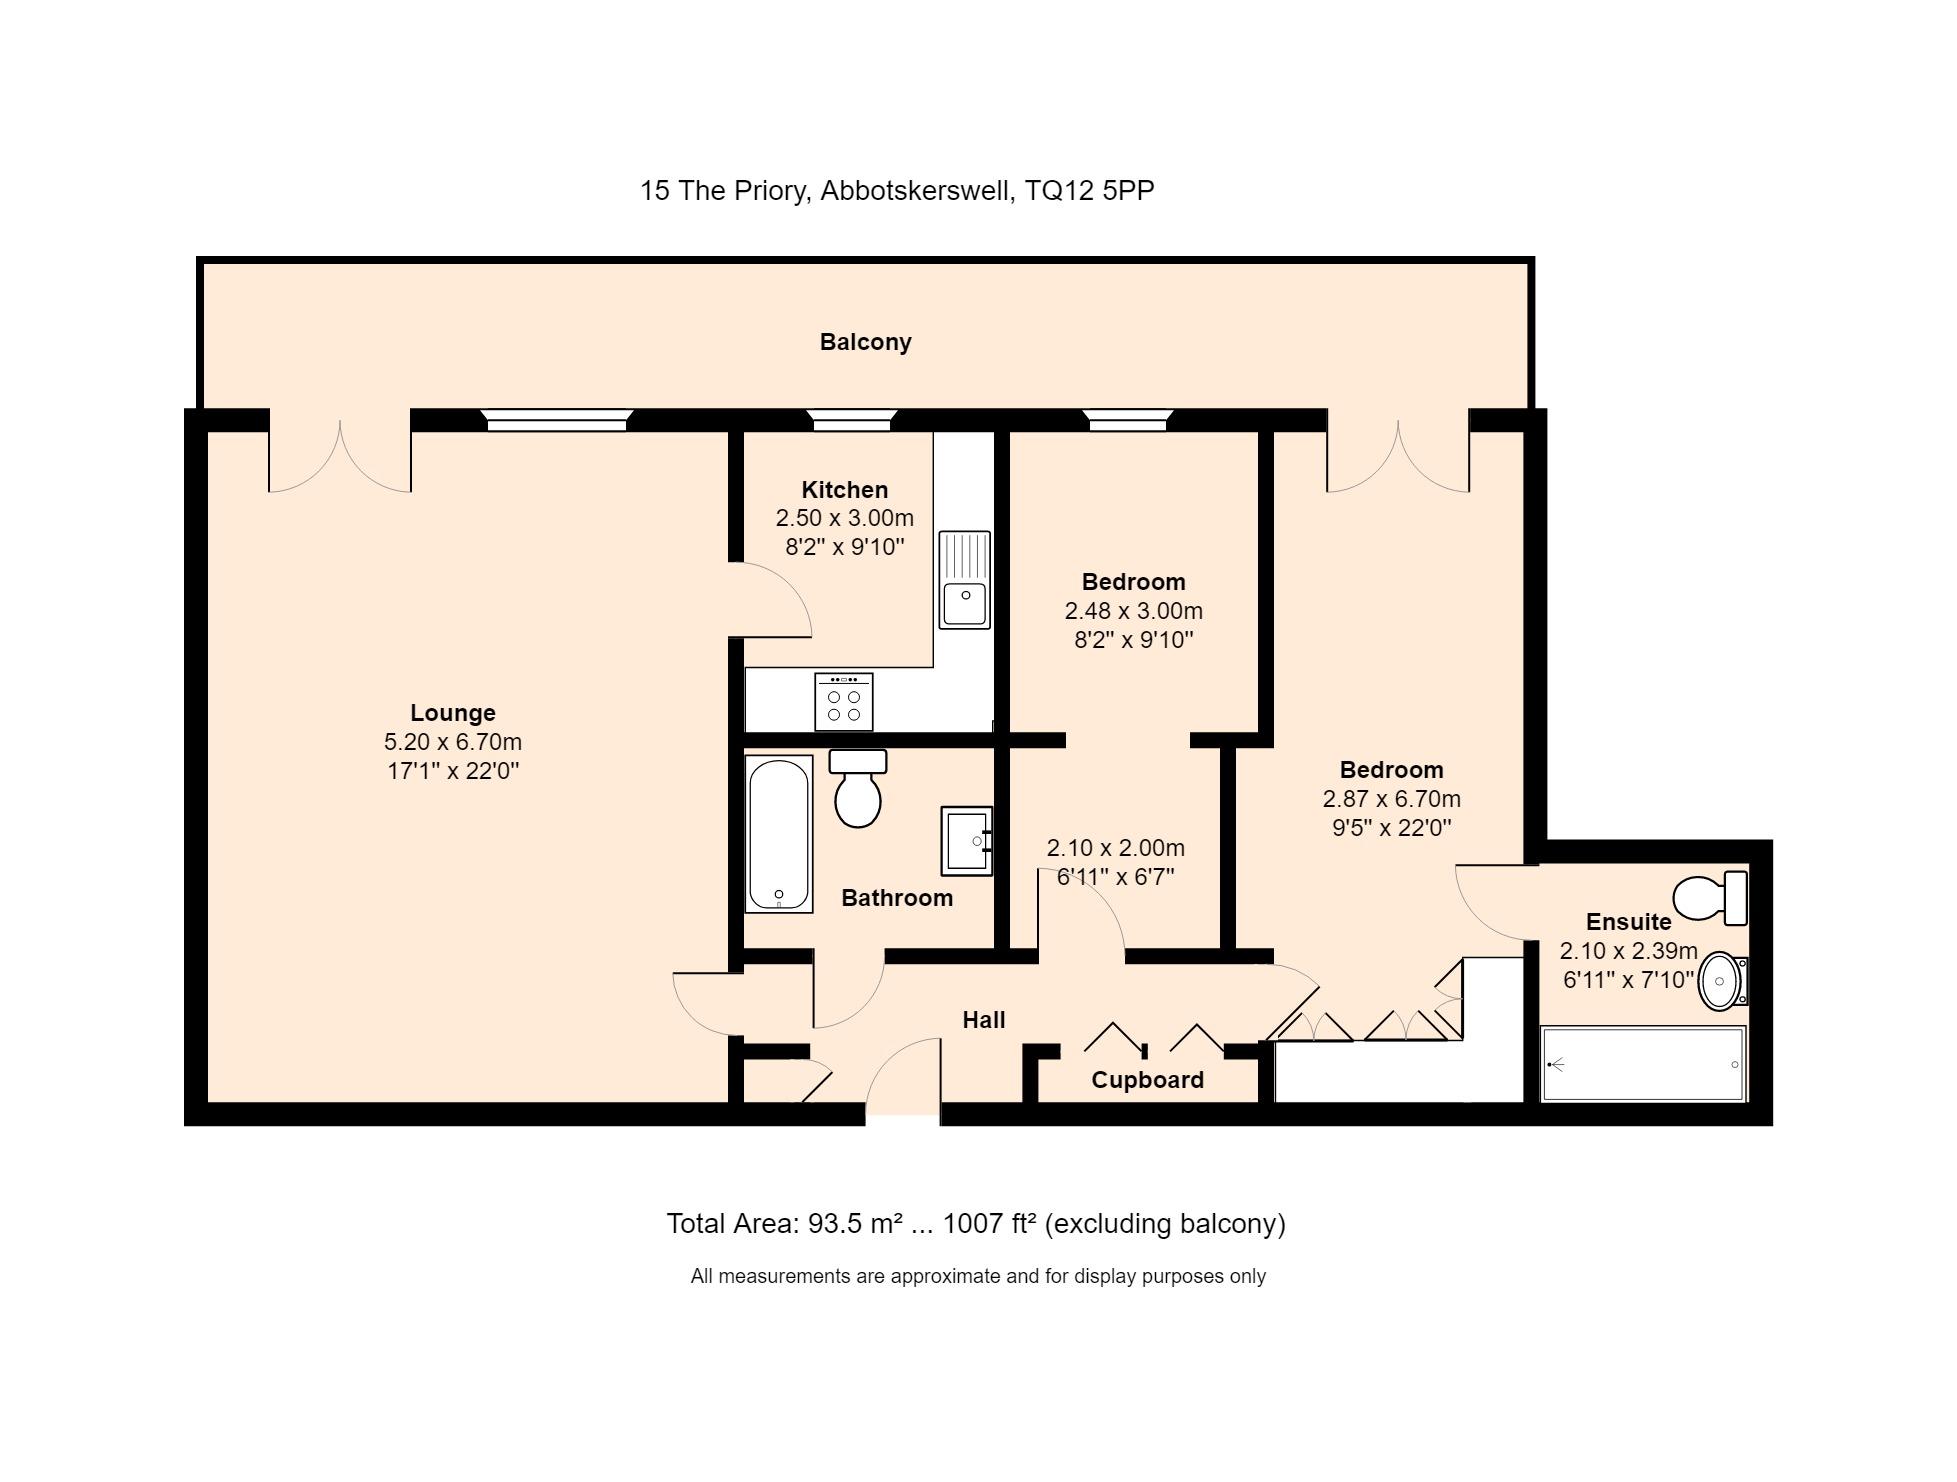 15 The Priory Floorplan